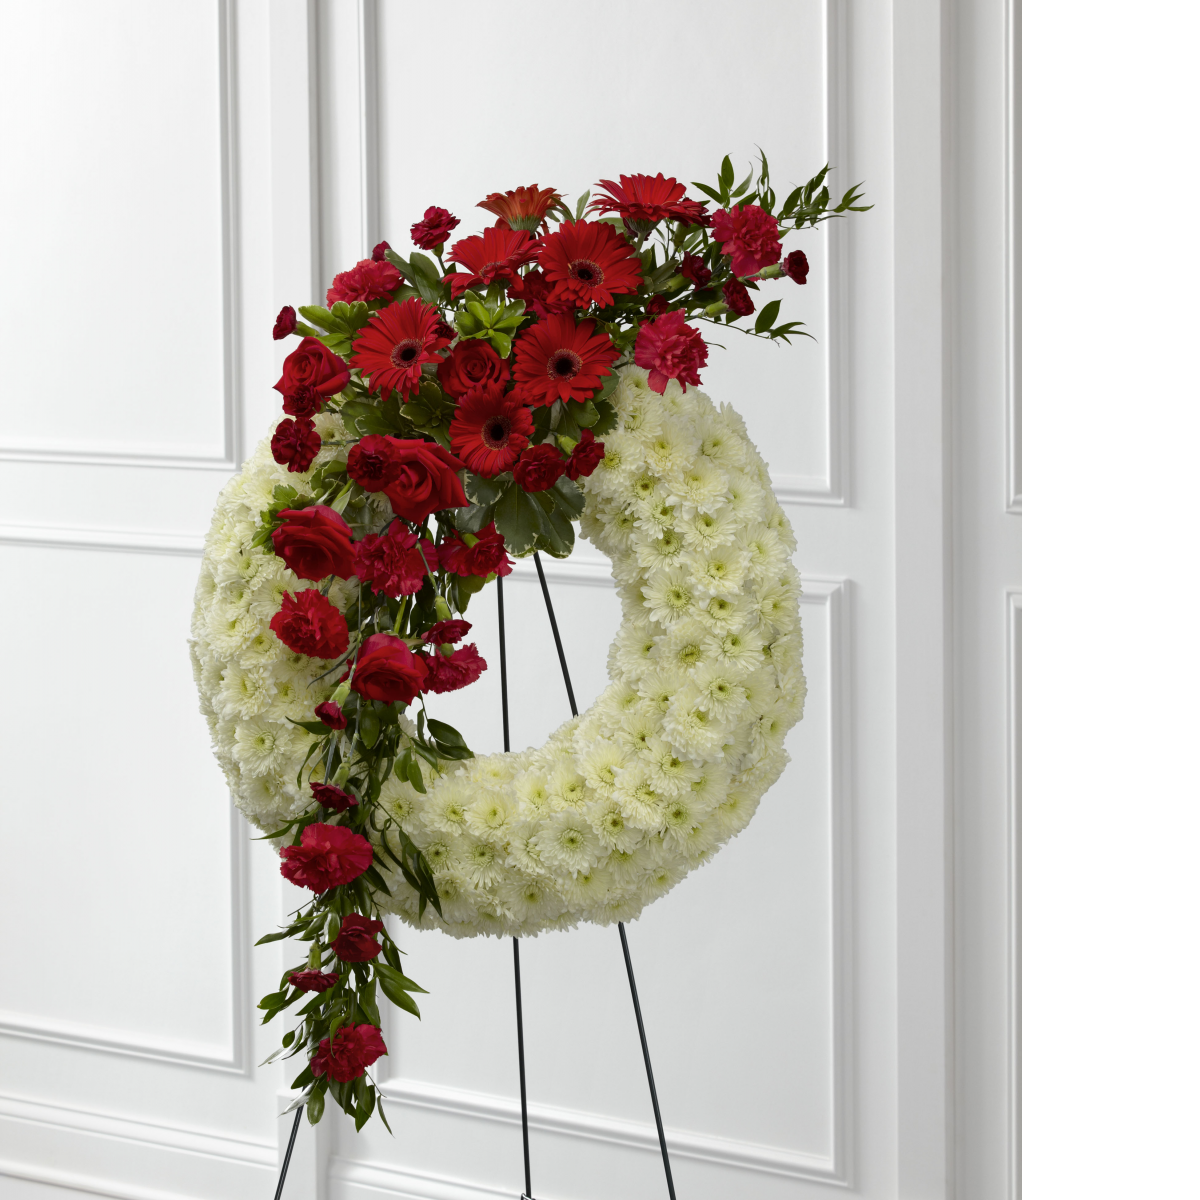 FTD® Graceful Tribute™ Wreath